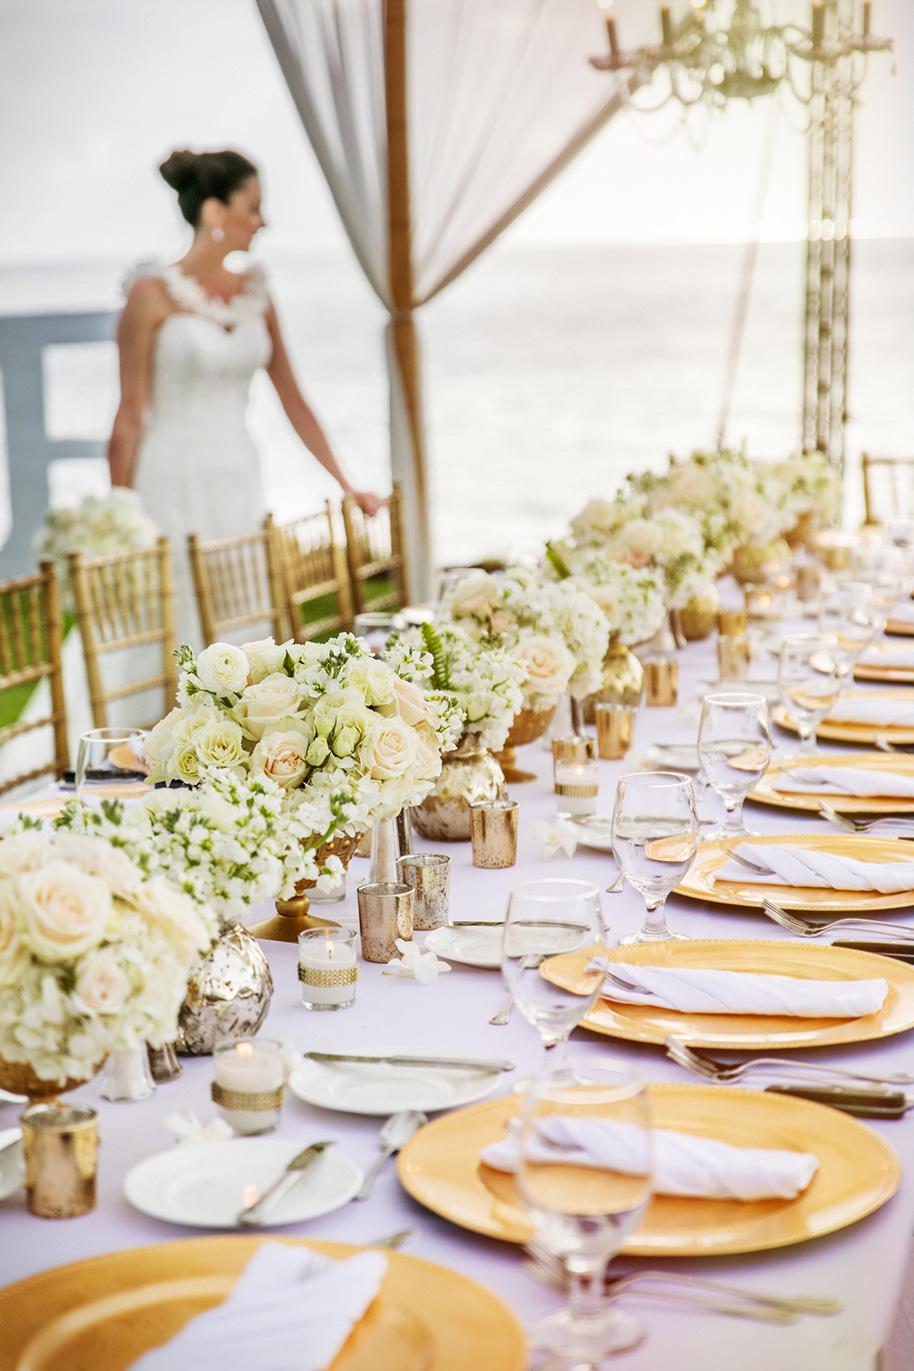 Maui-Ocean-Front-Wedding-070816-24.jpg